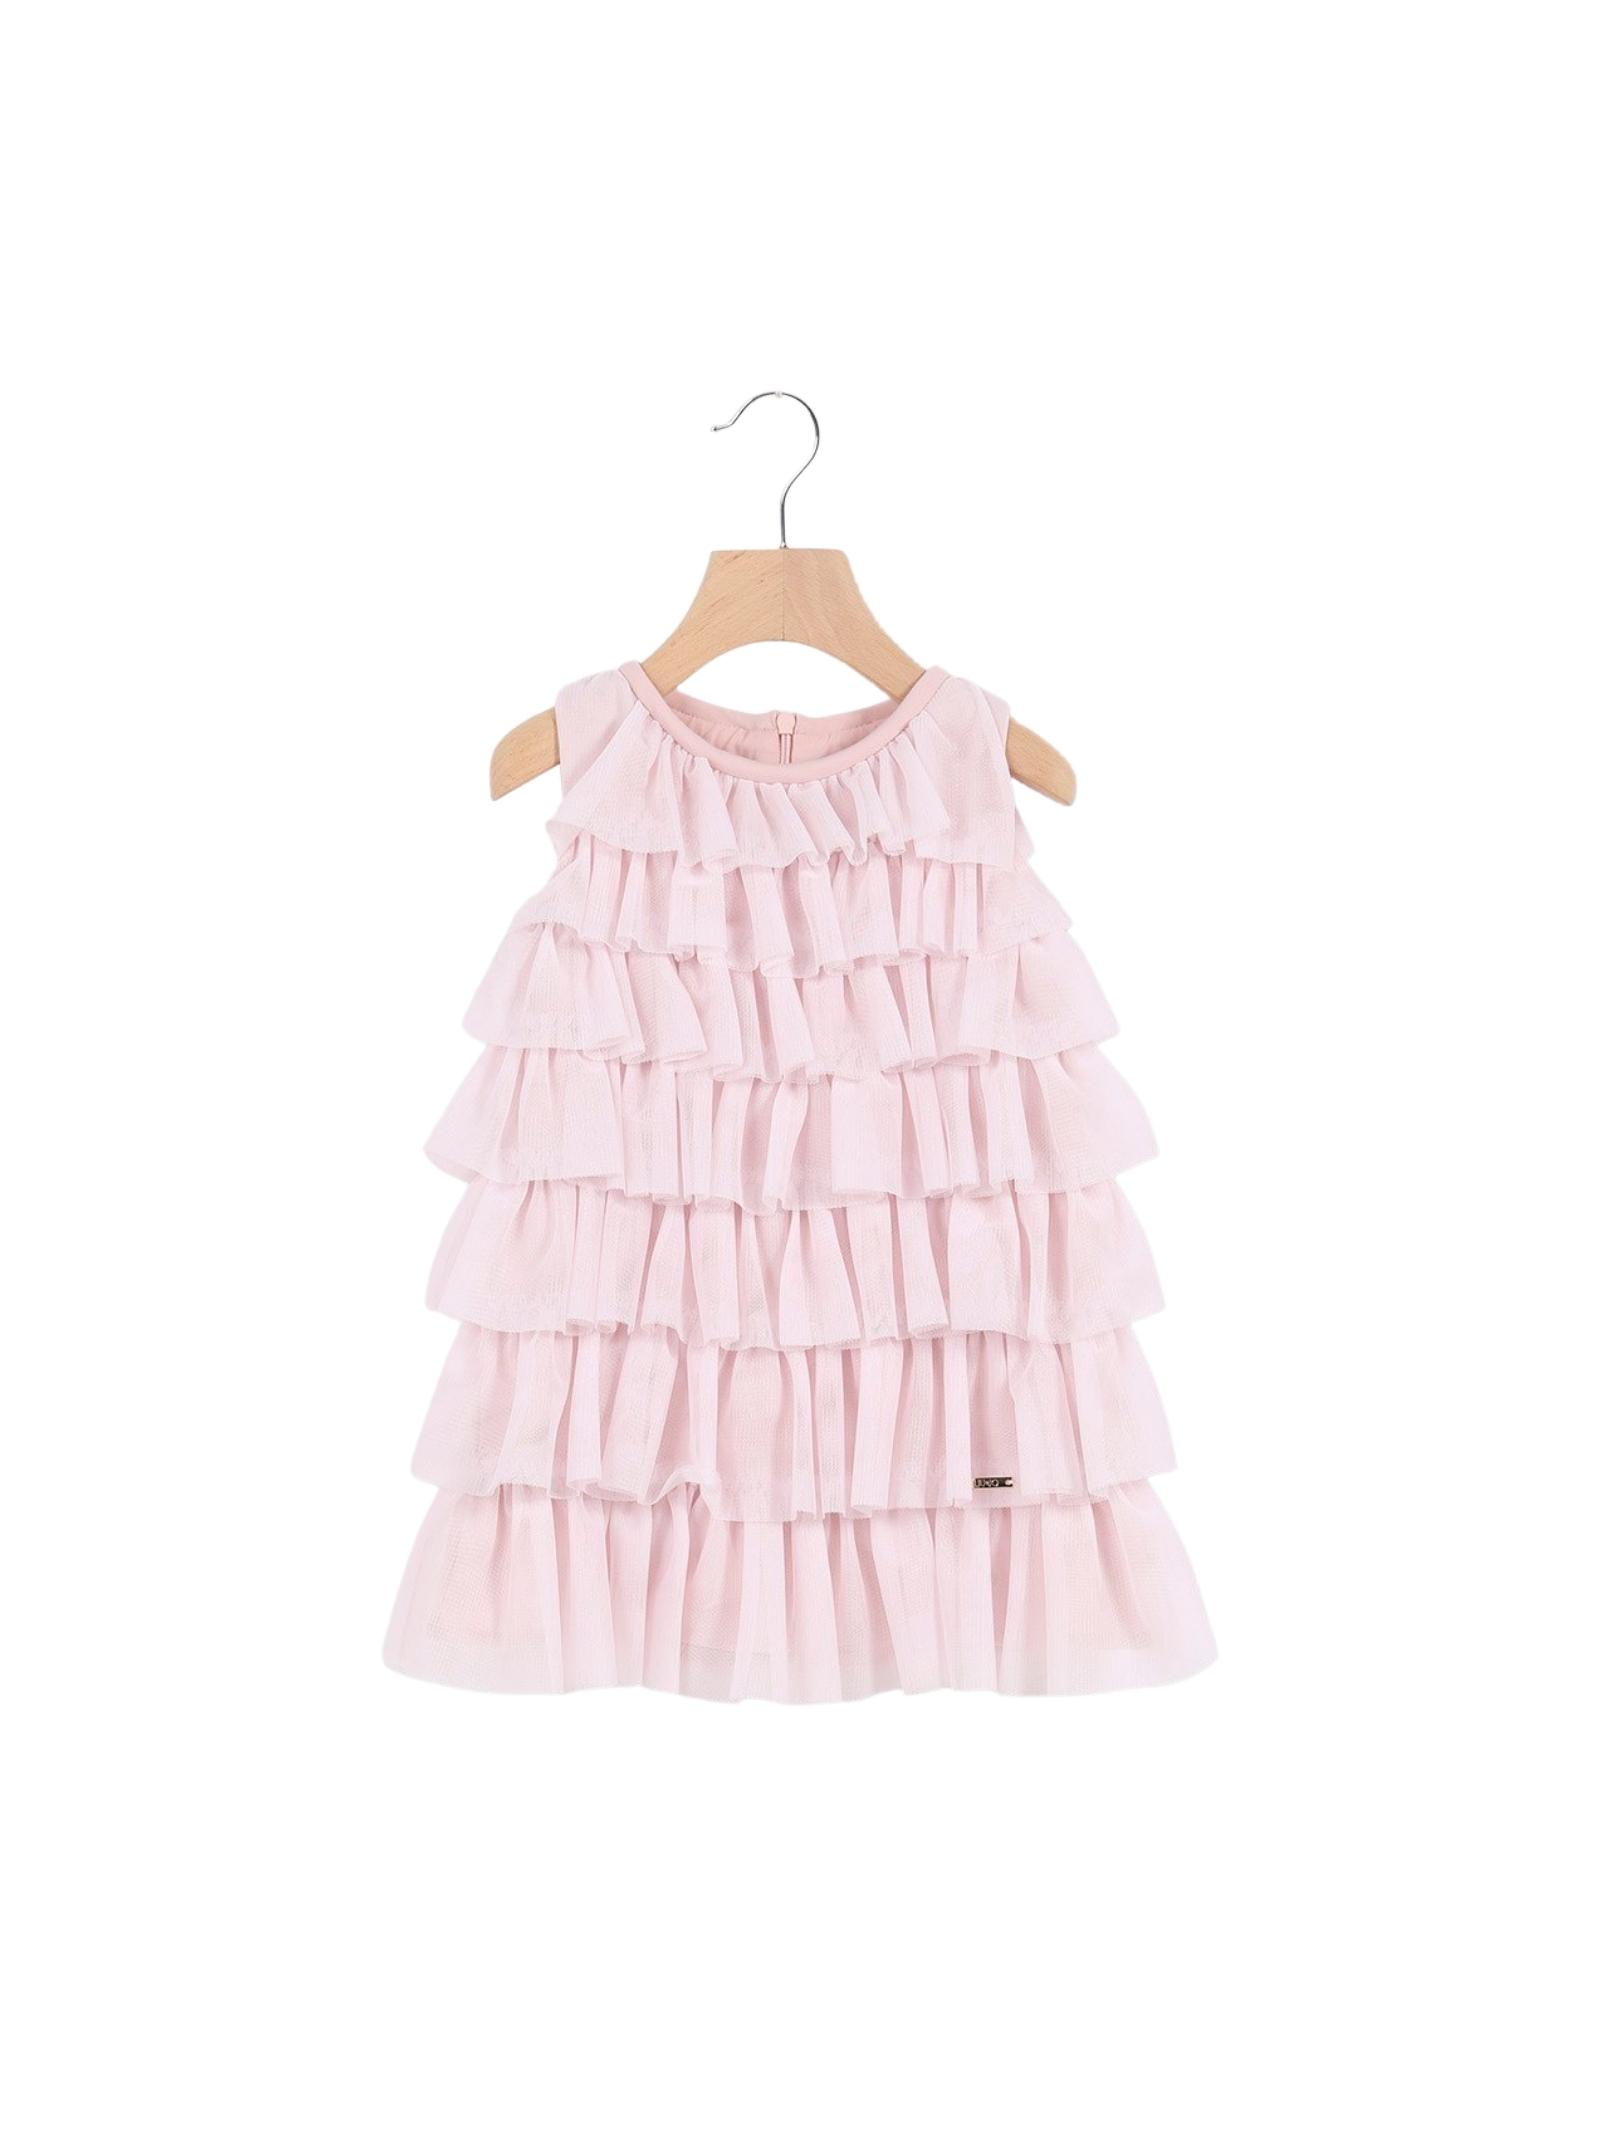 Vestito Bambina Balze Pink LIU-JO JUNIOR | Vestiti | KA1144J766741309